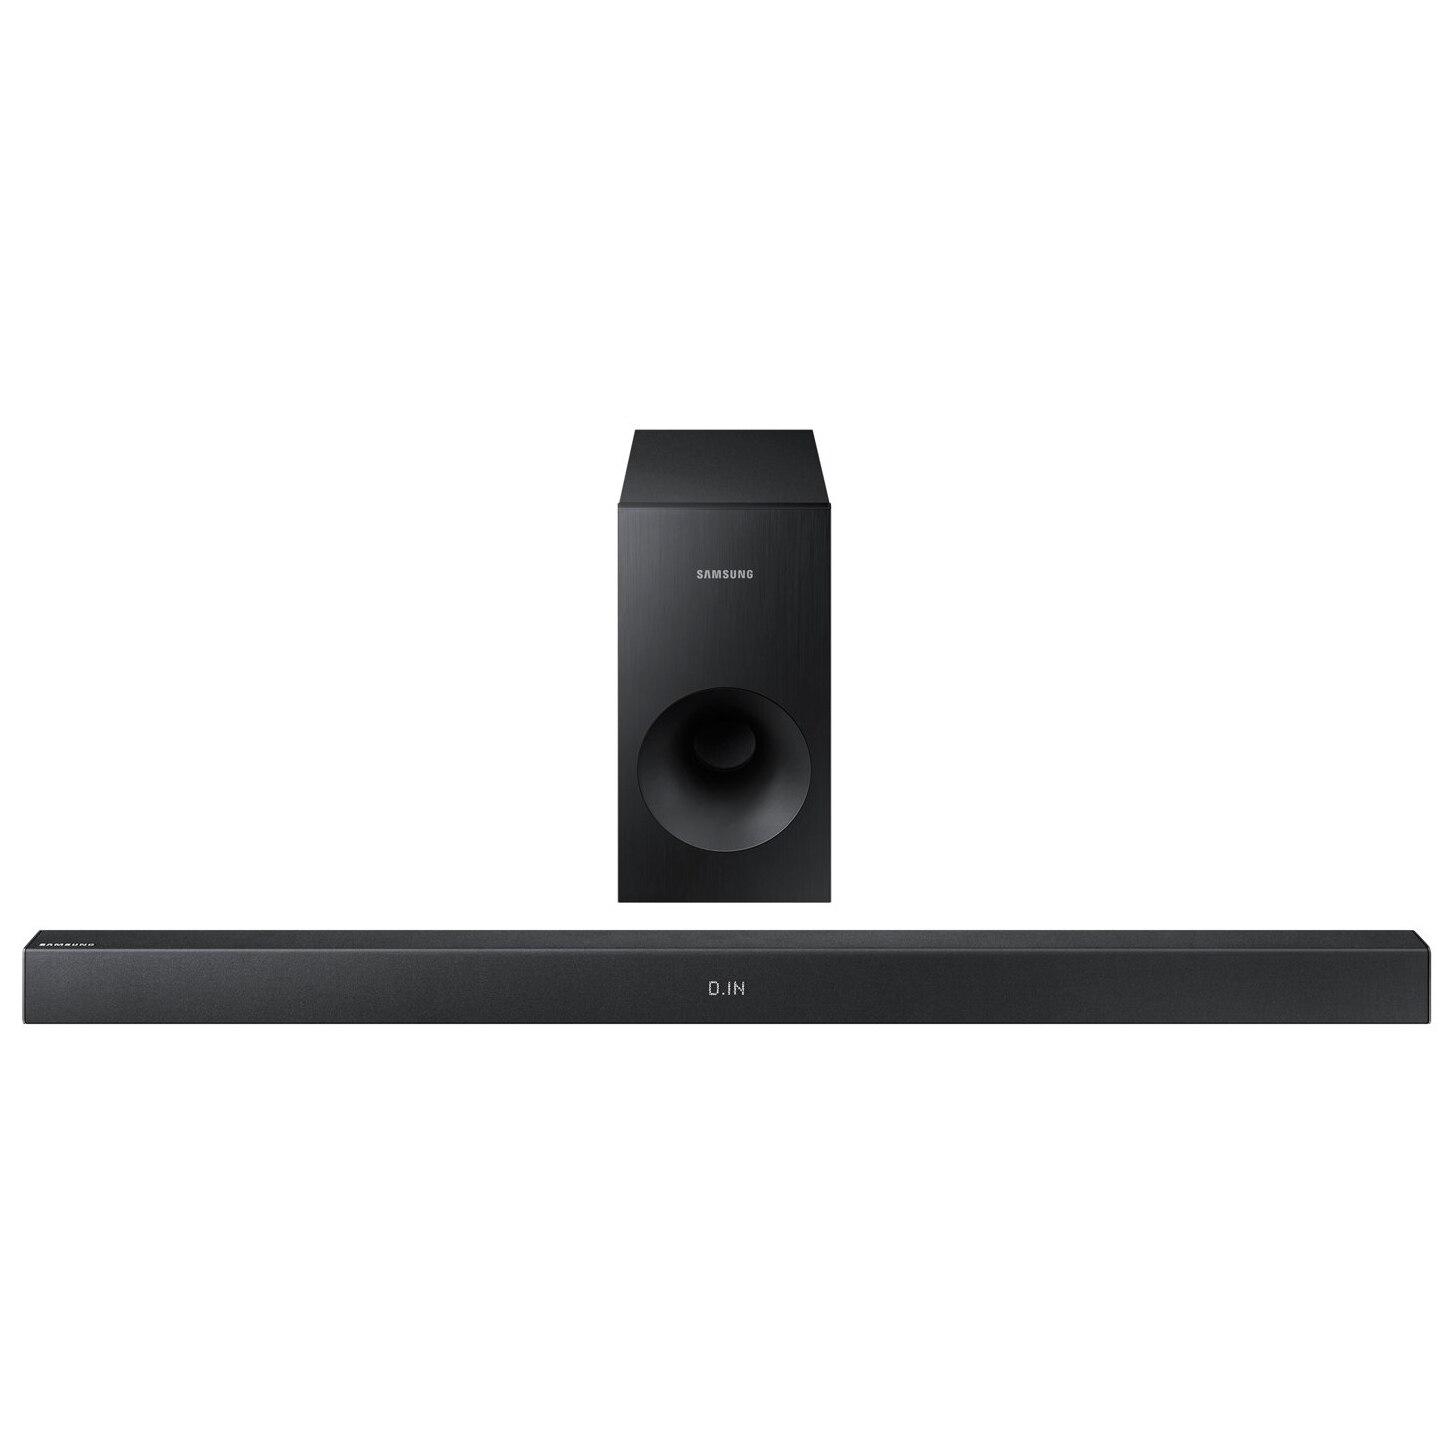 Fotografie Soundbar Samsung HW-K335, 130W, 2.1, Bluetooth, USB, negru